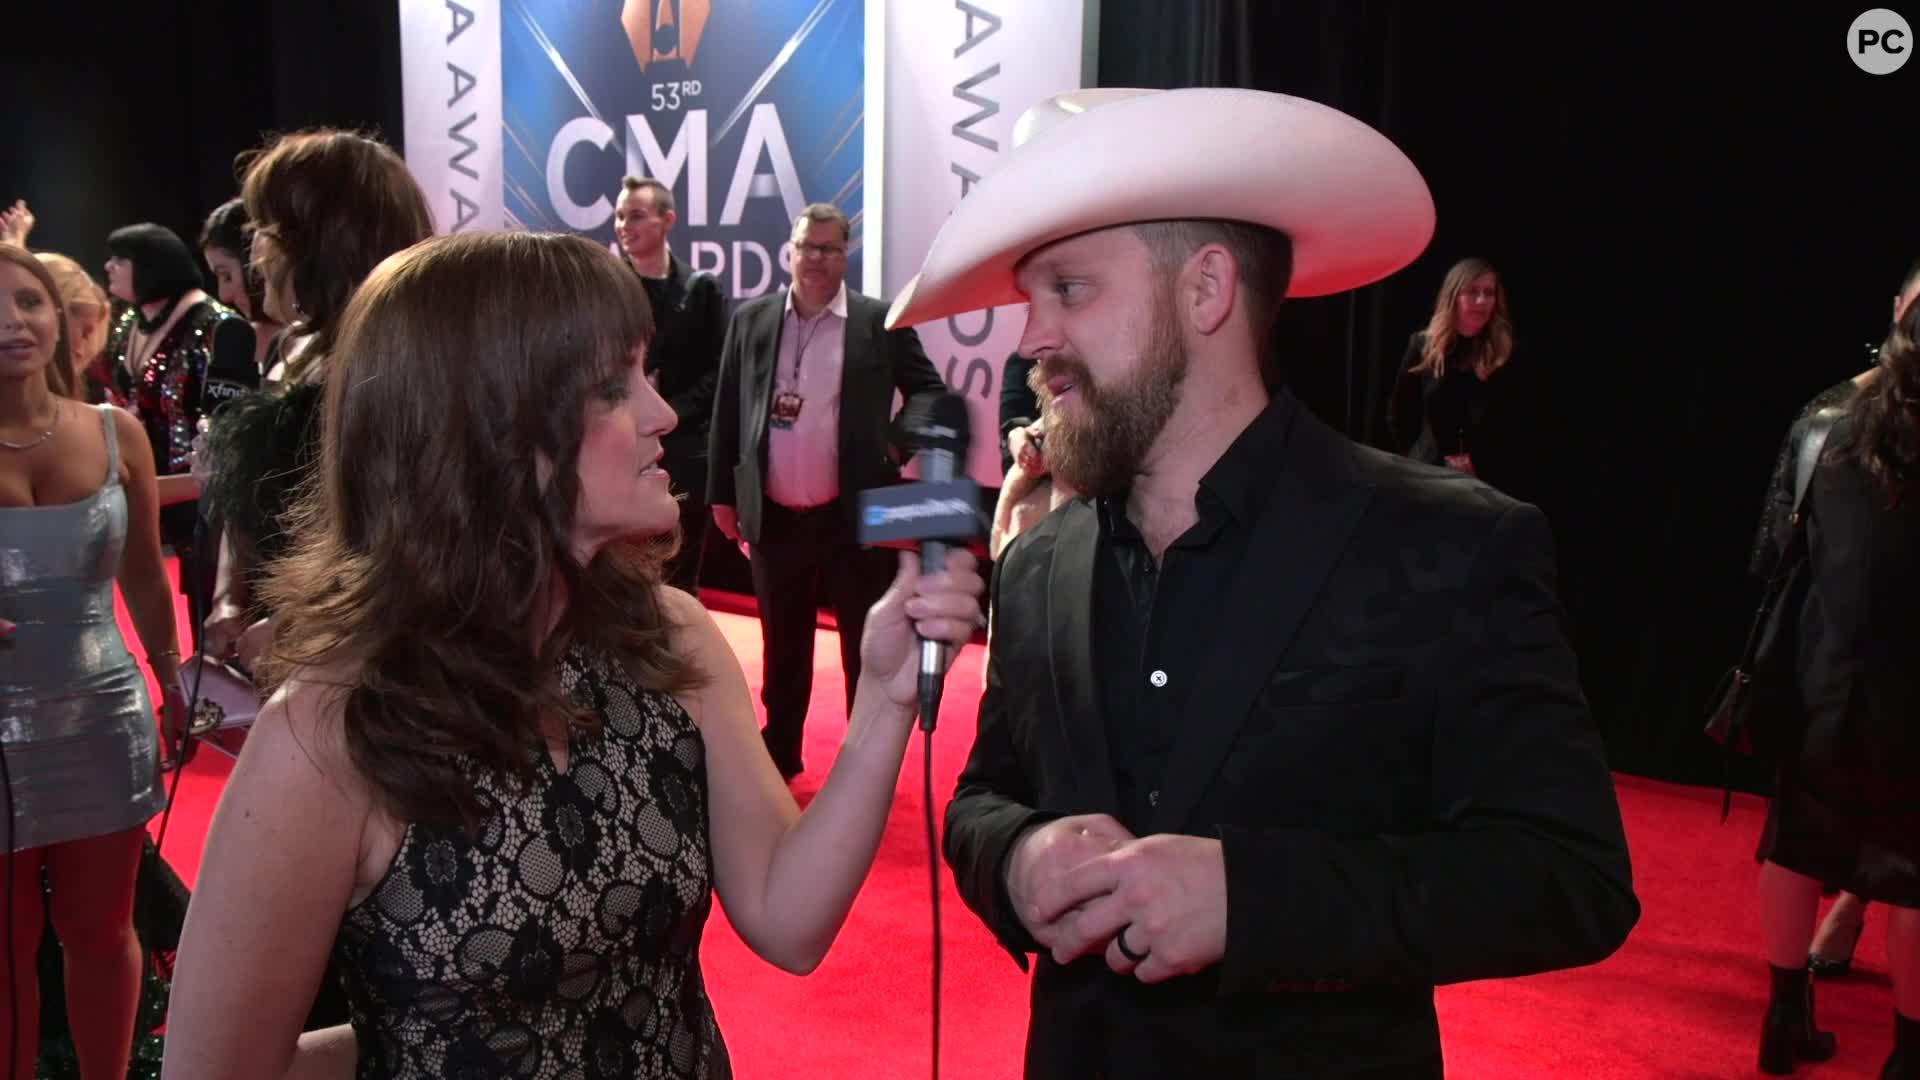 Justin Moore - 2019 CMA Awards screen capture